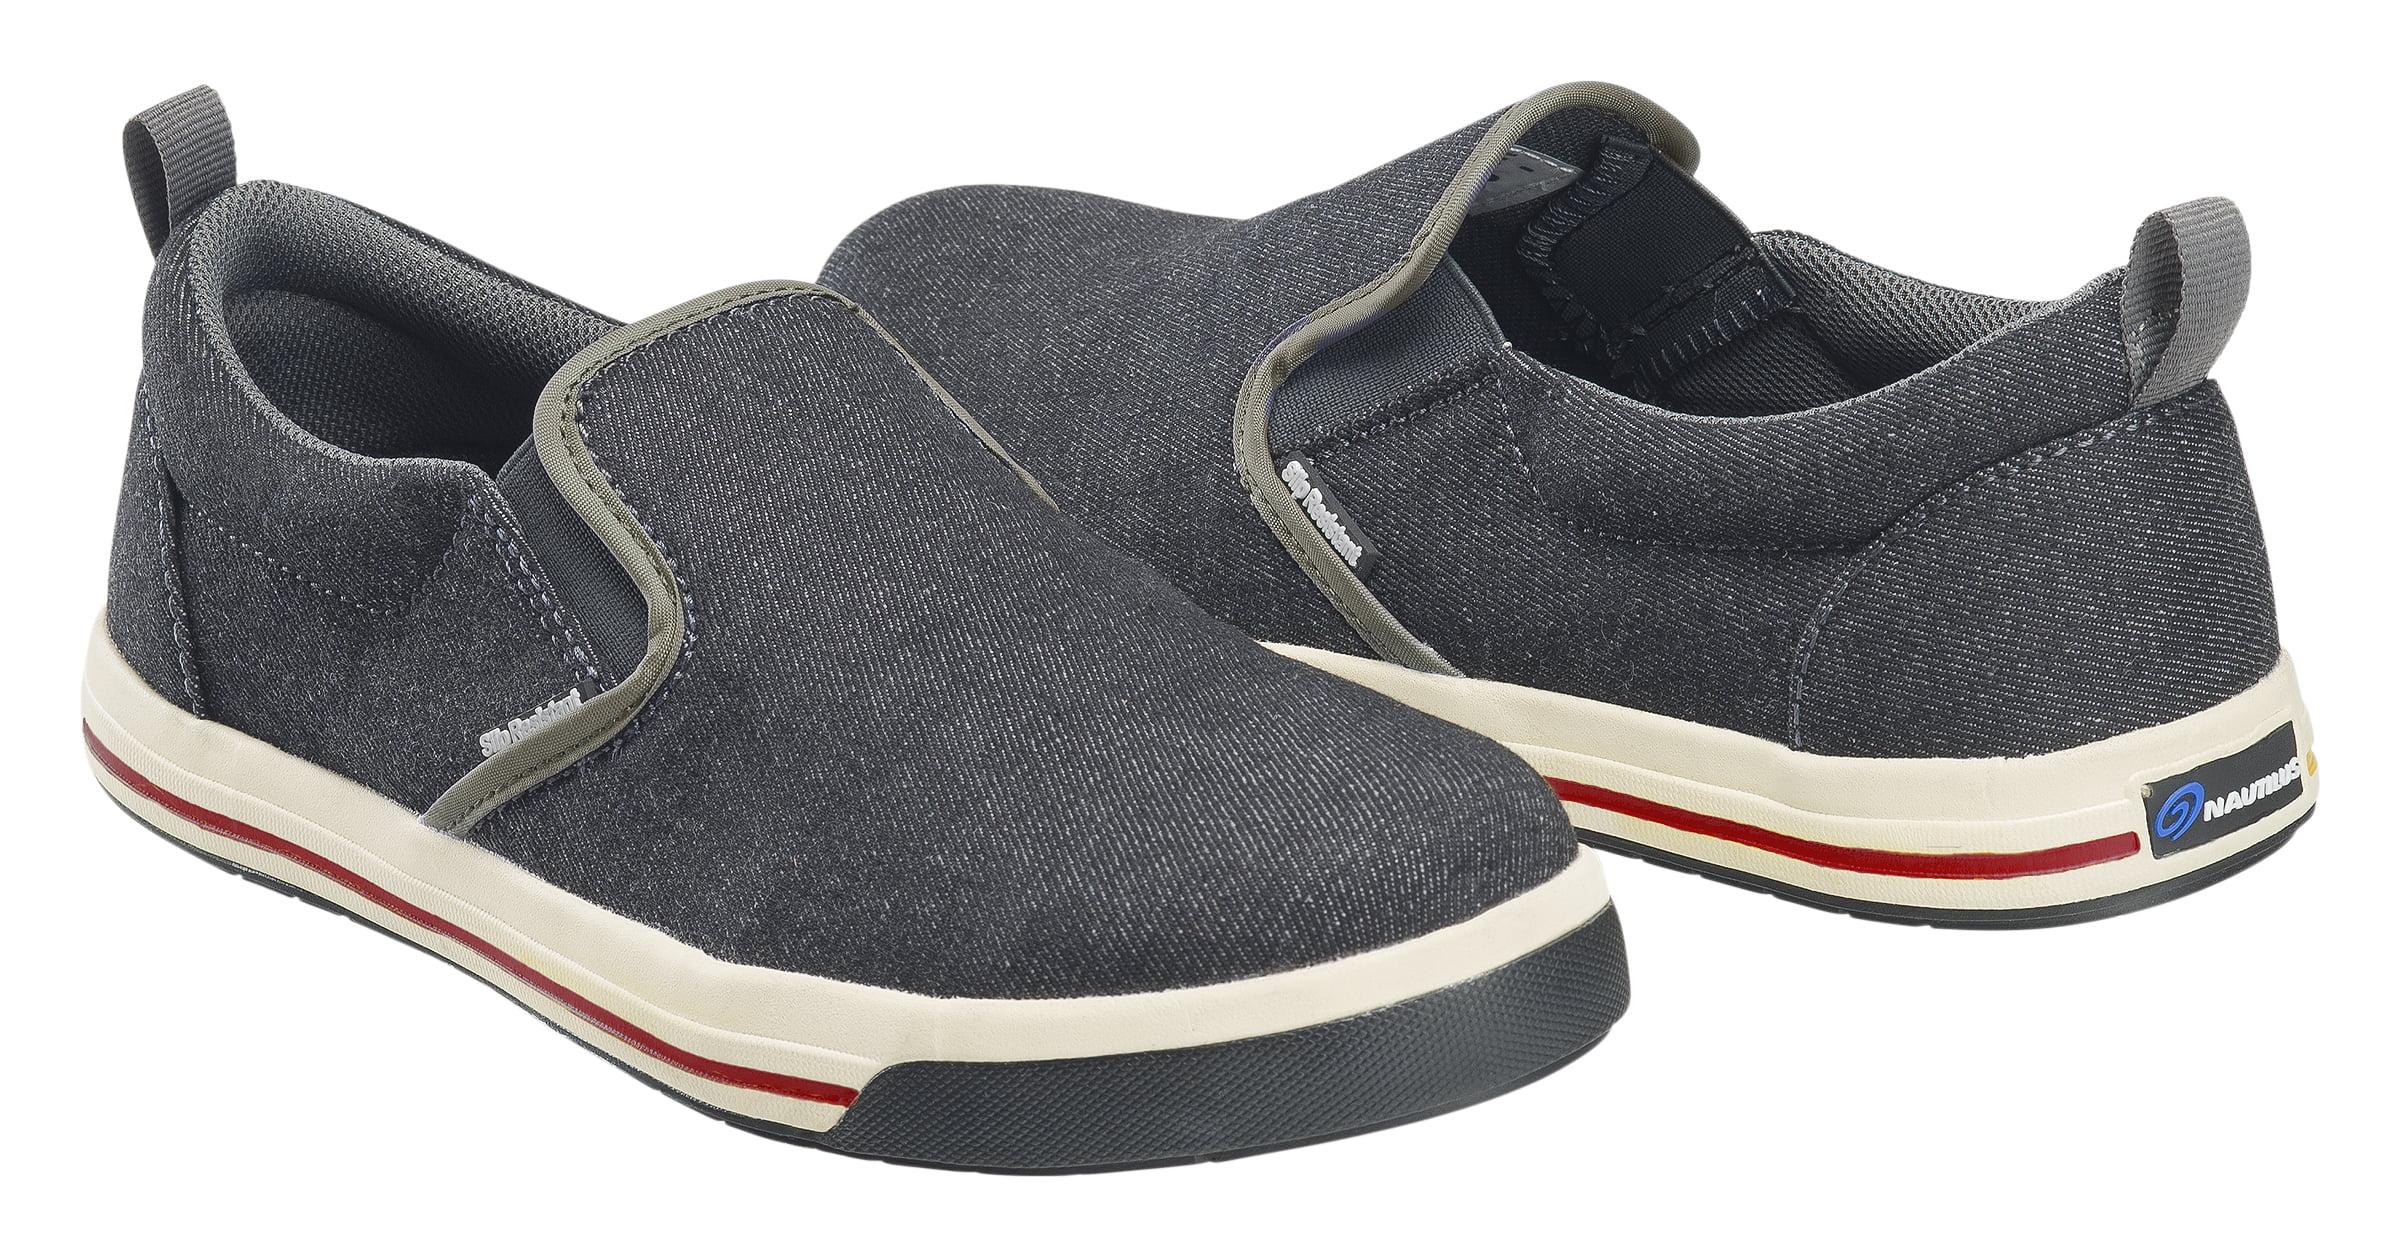 Nautilus Safety Footwear Women S Safety Slip On Casual Safety Toe Shoe Walmart Com Walmart Com